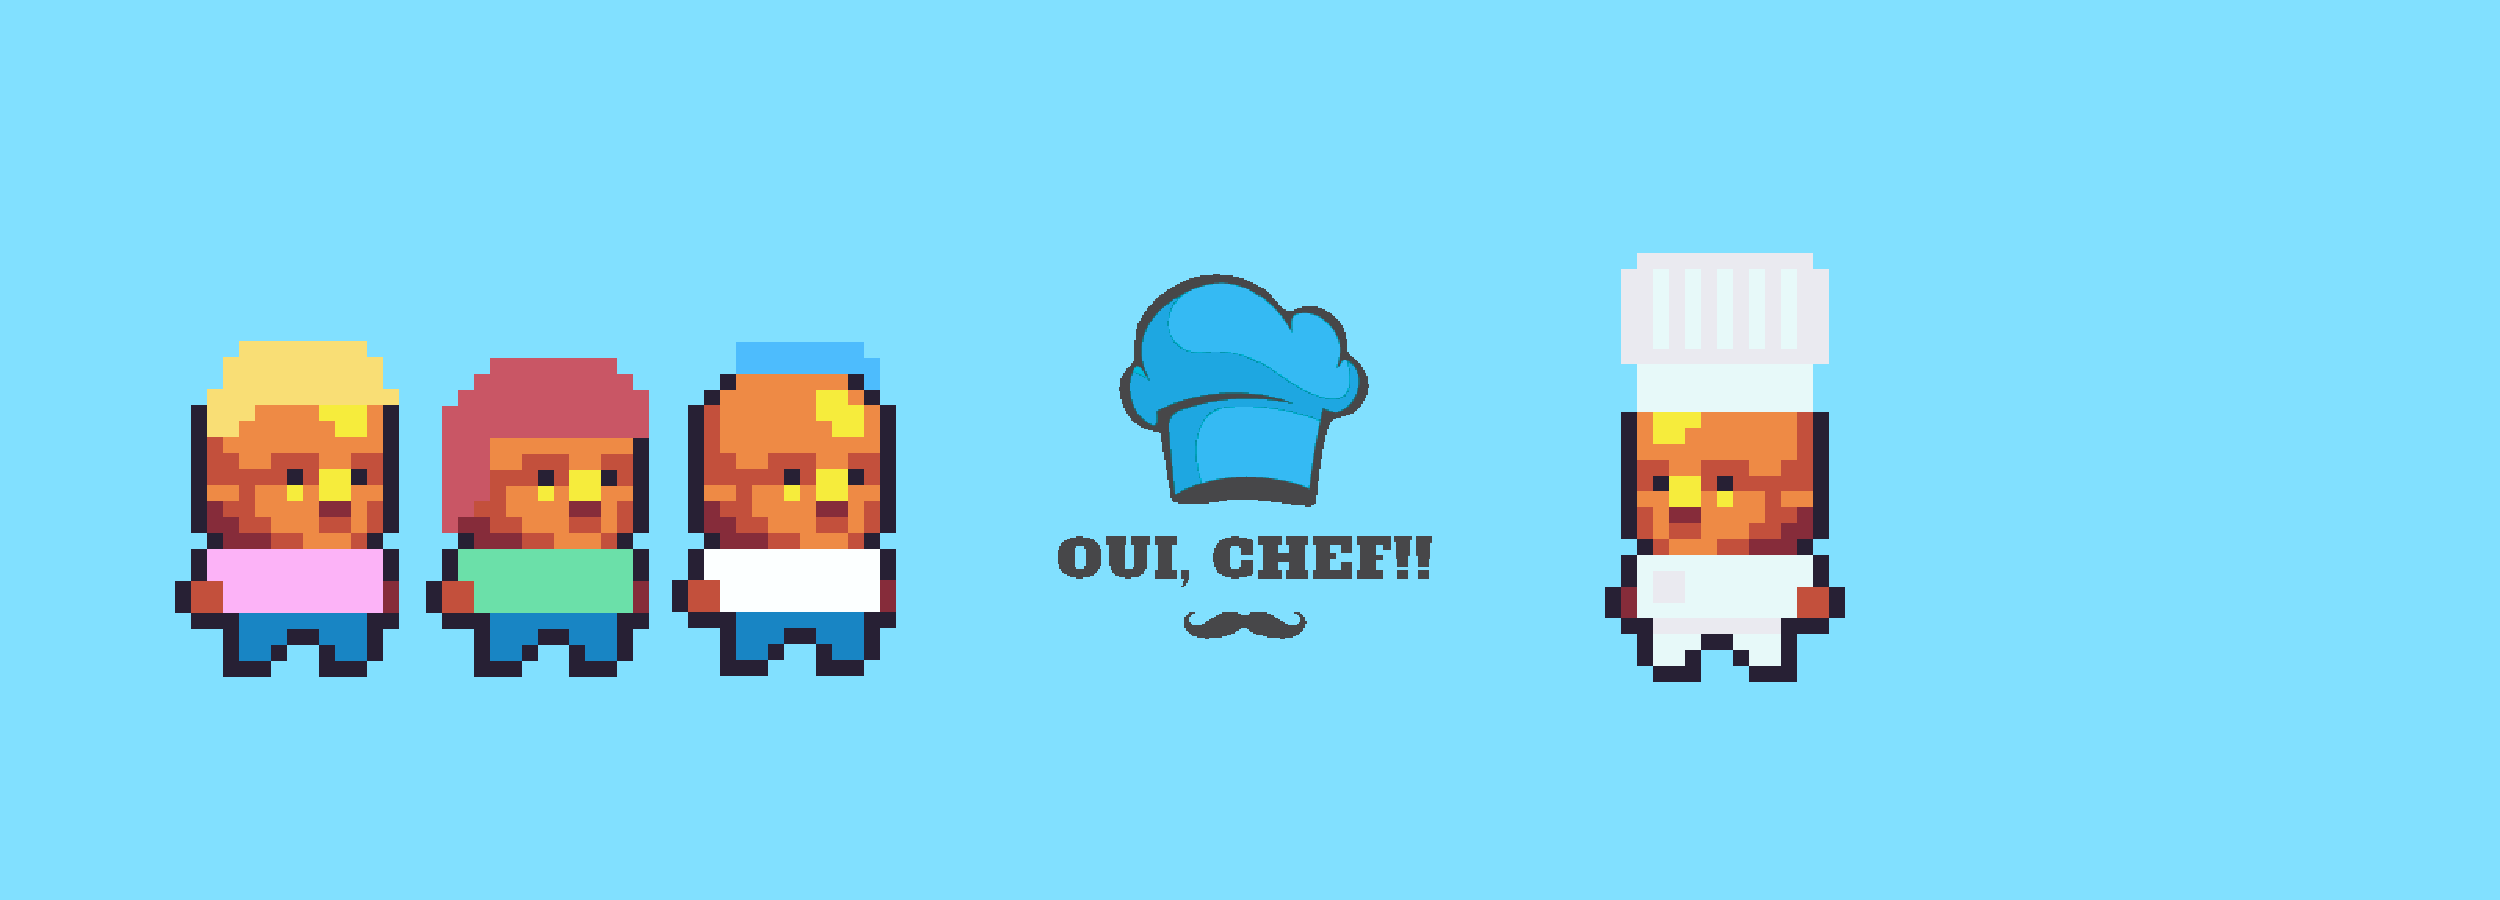 Oui, Chef!!